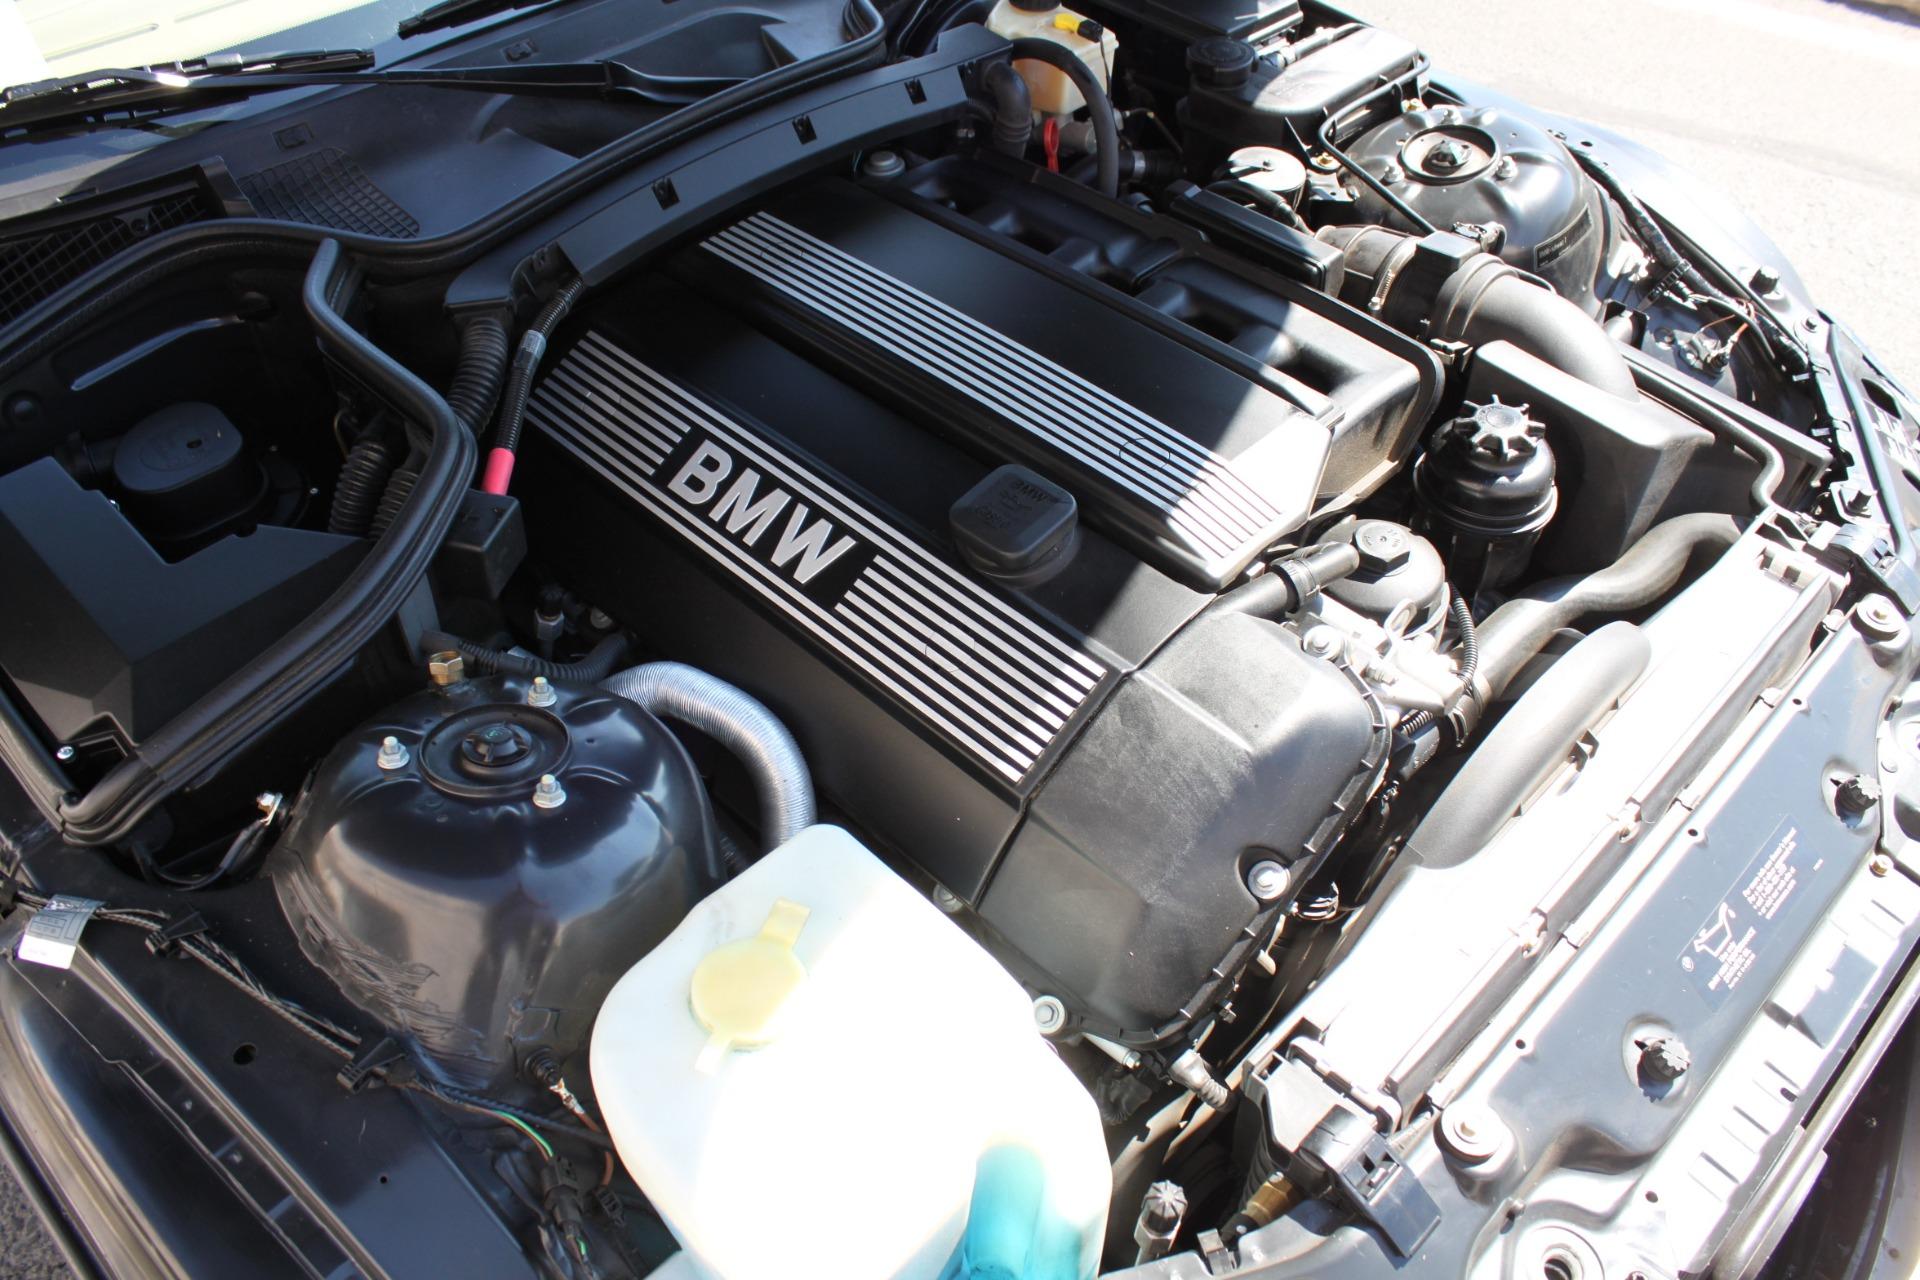 Used-2001-BMW-Z3-Roadster-30i-Mercedes-Benz